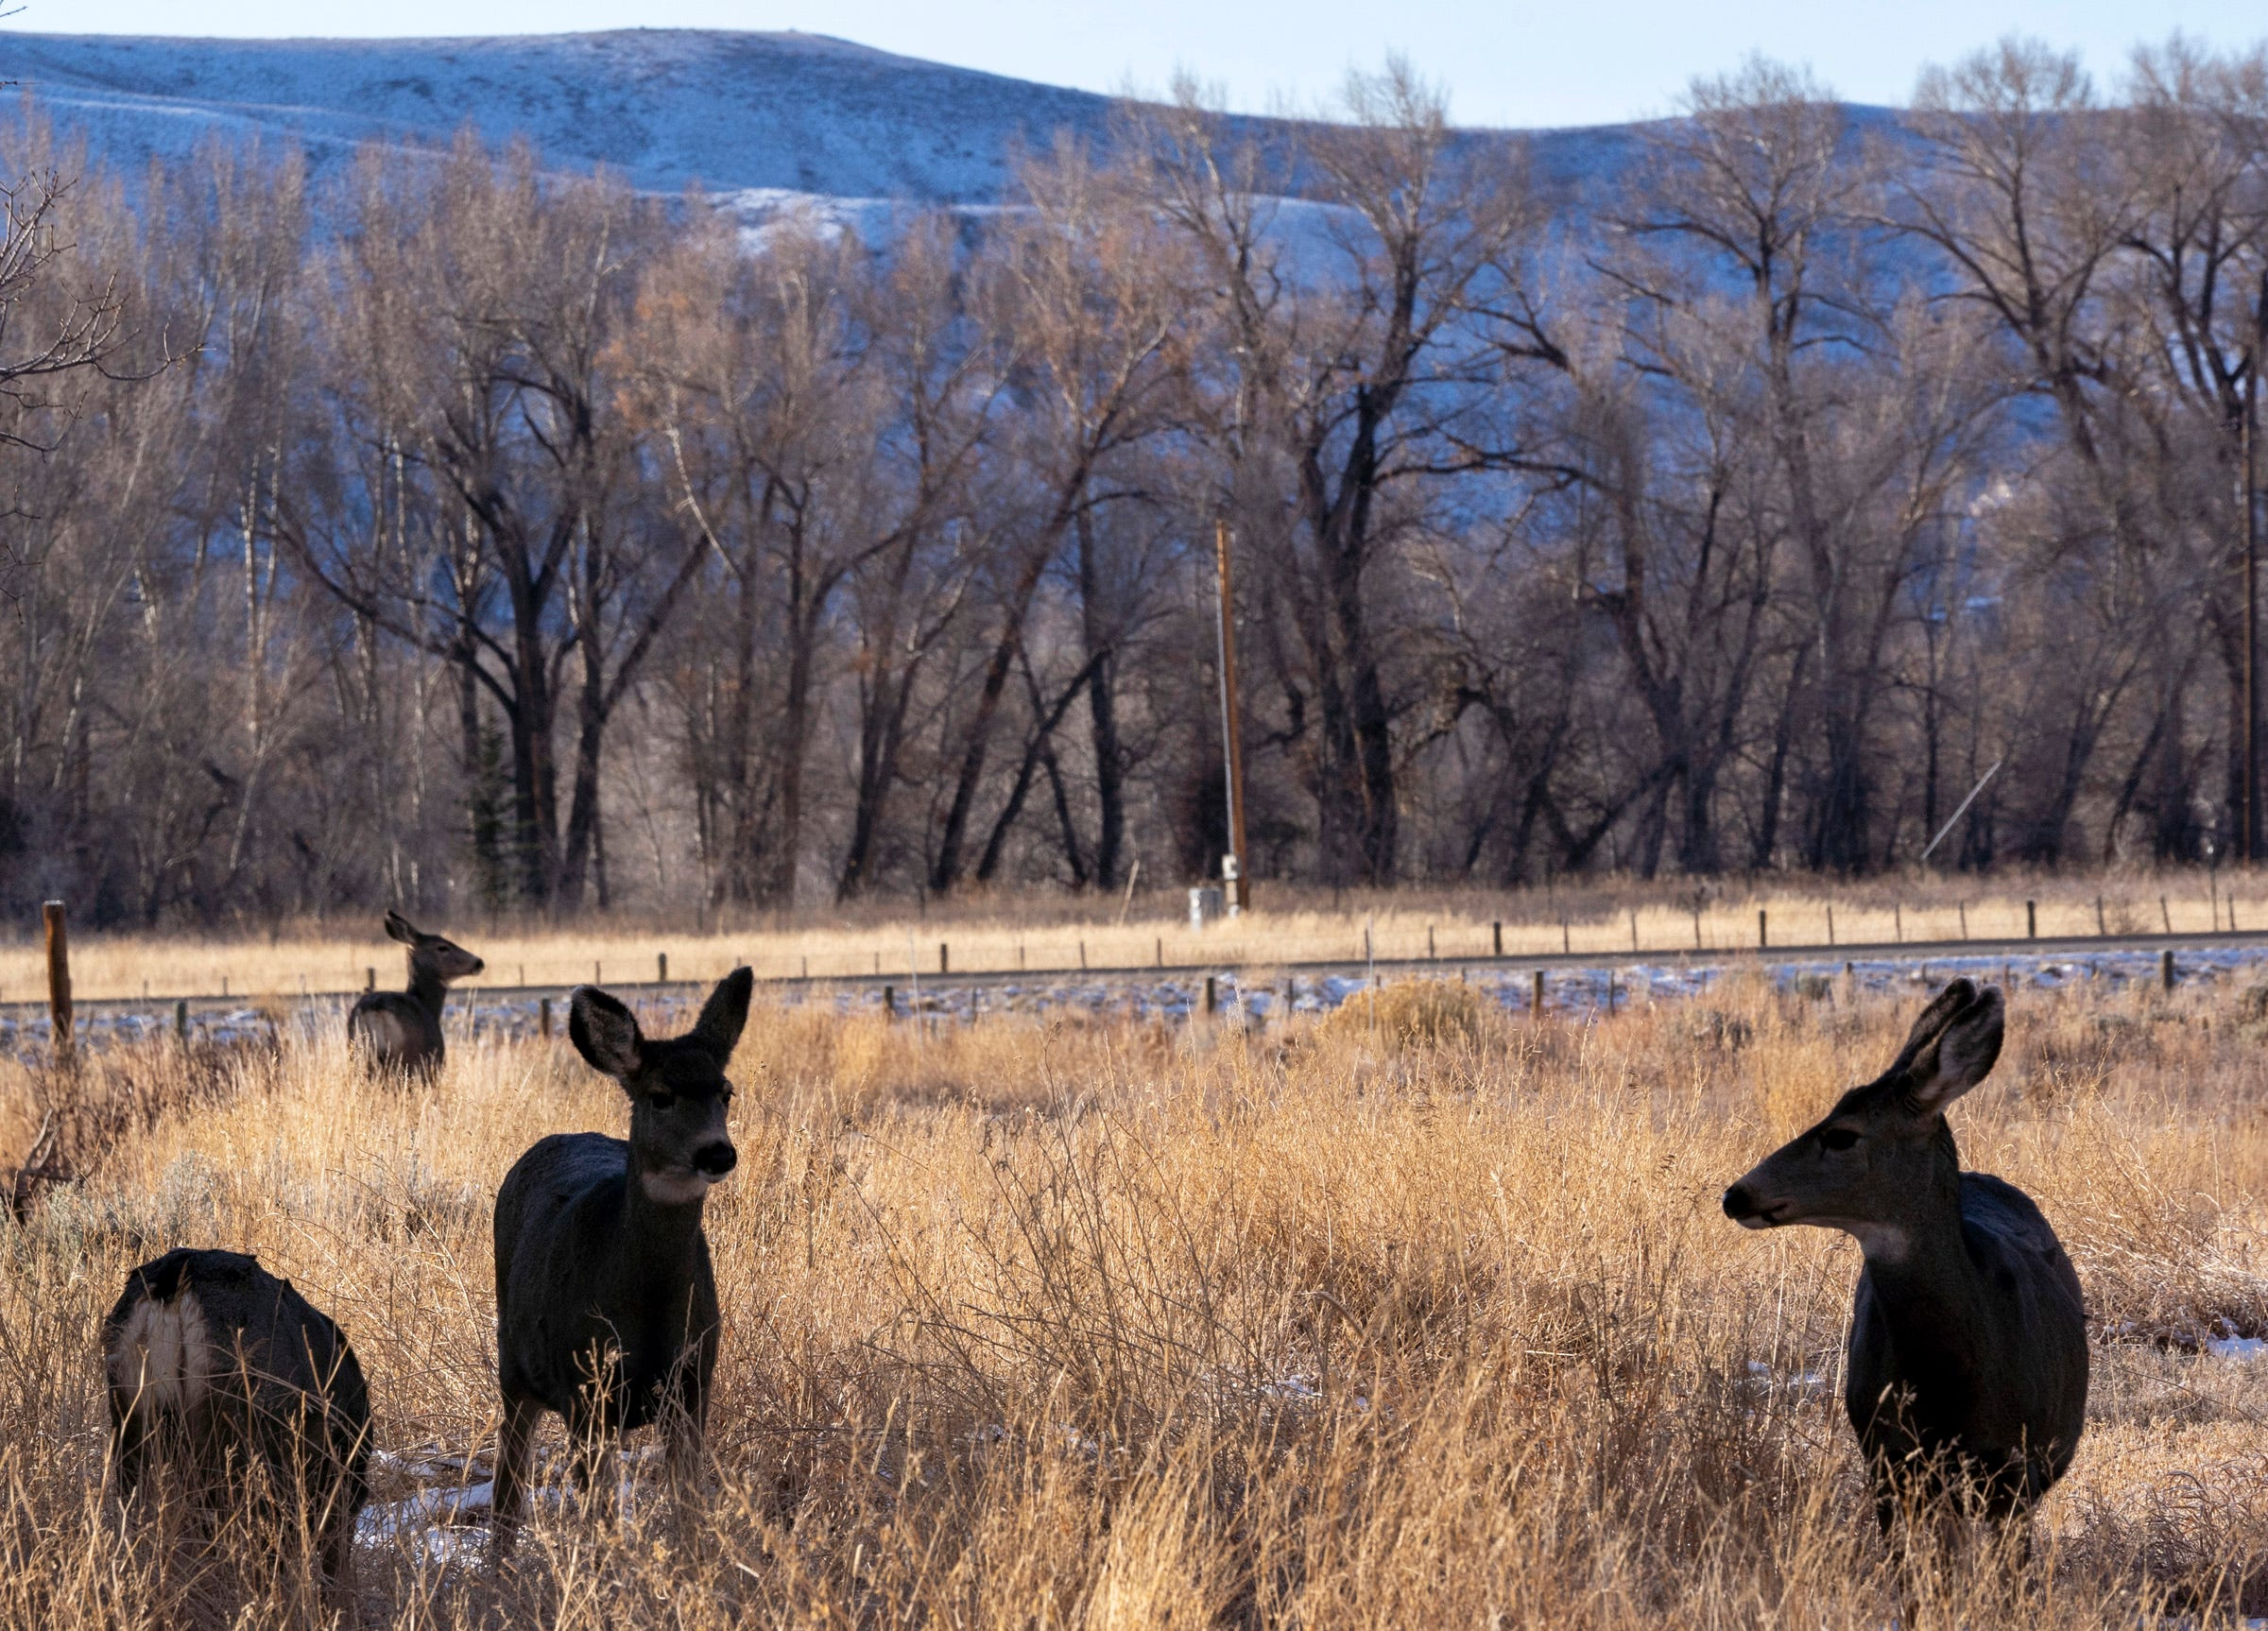 Deer forage near the Gunnison River in Colorado.